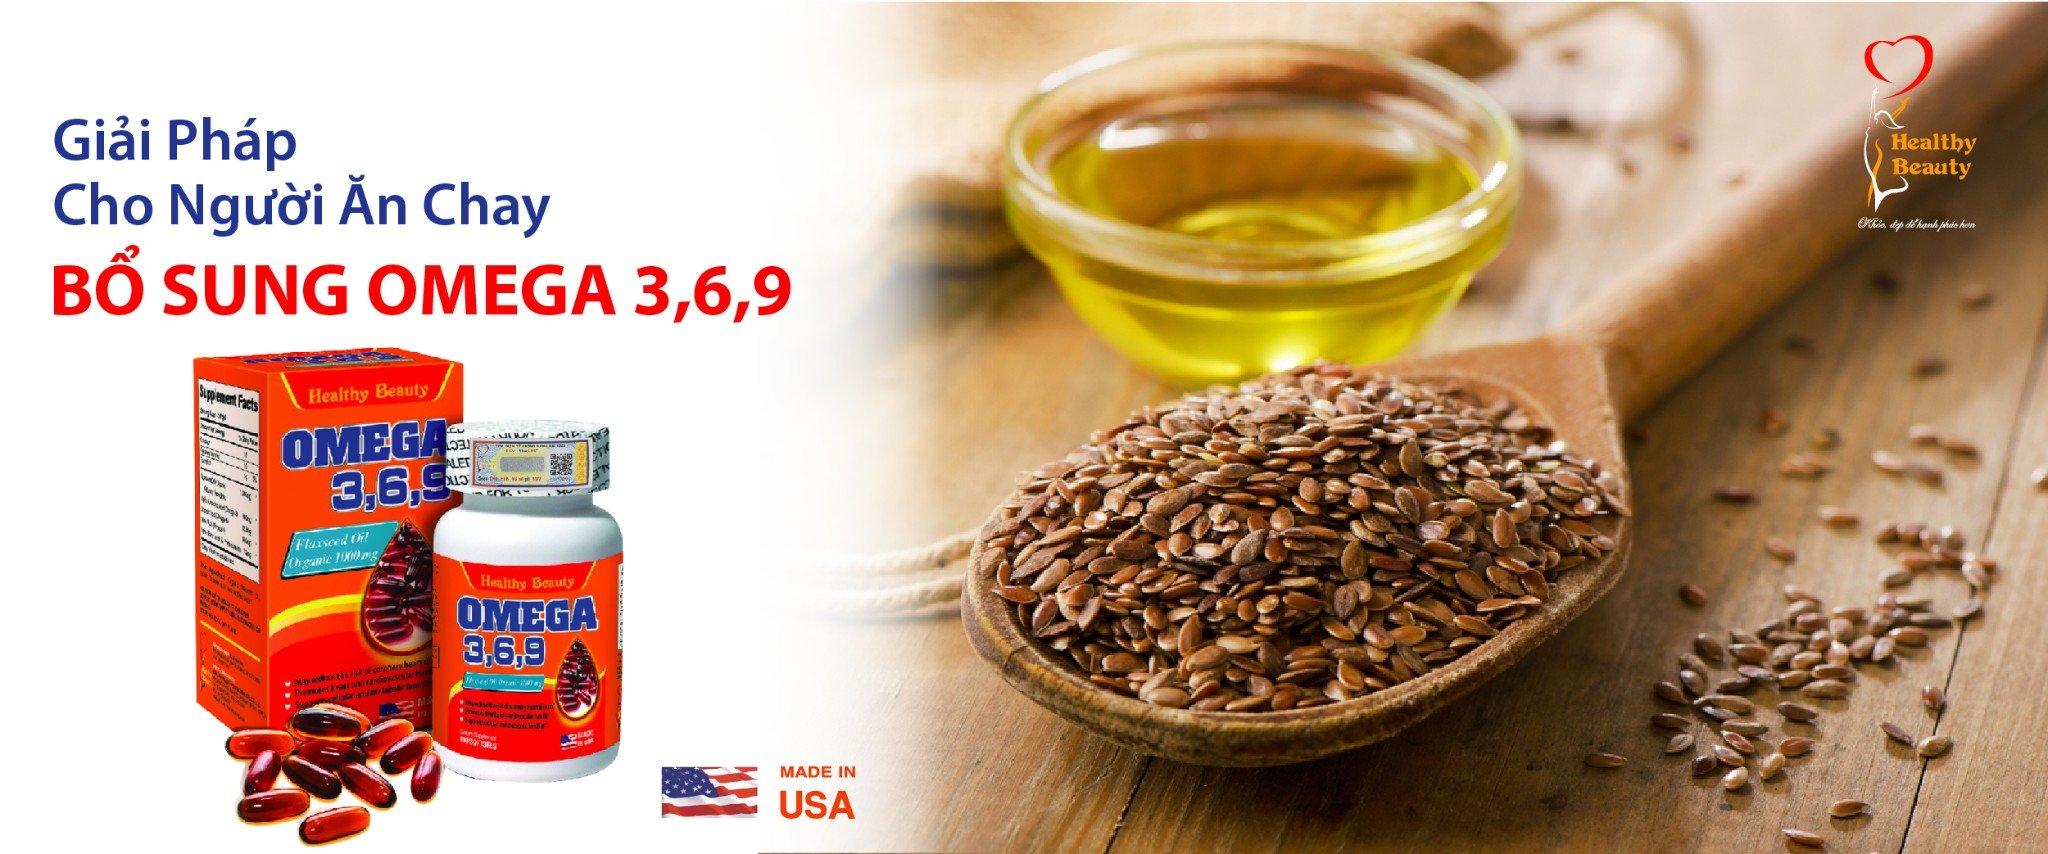 Healthy Beauty Omega 3,6,9 giải pháp cho người ăn chay